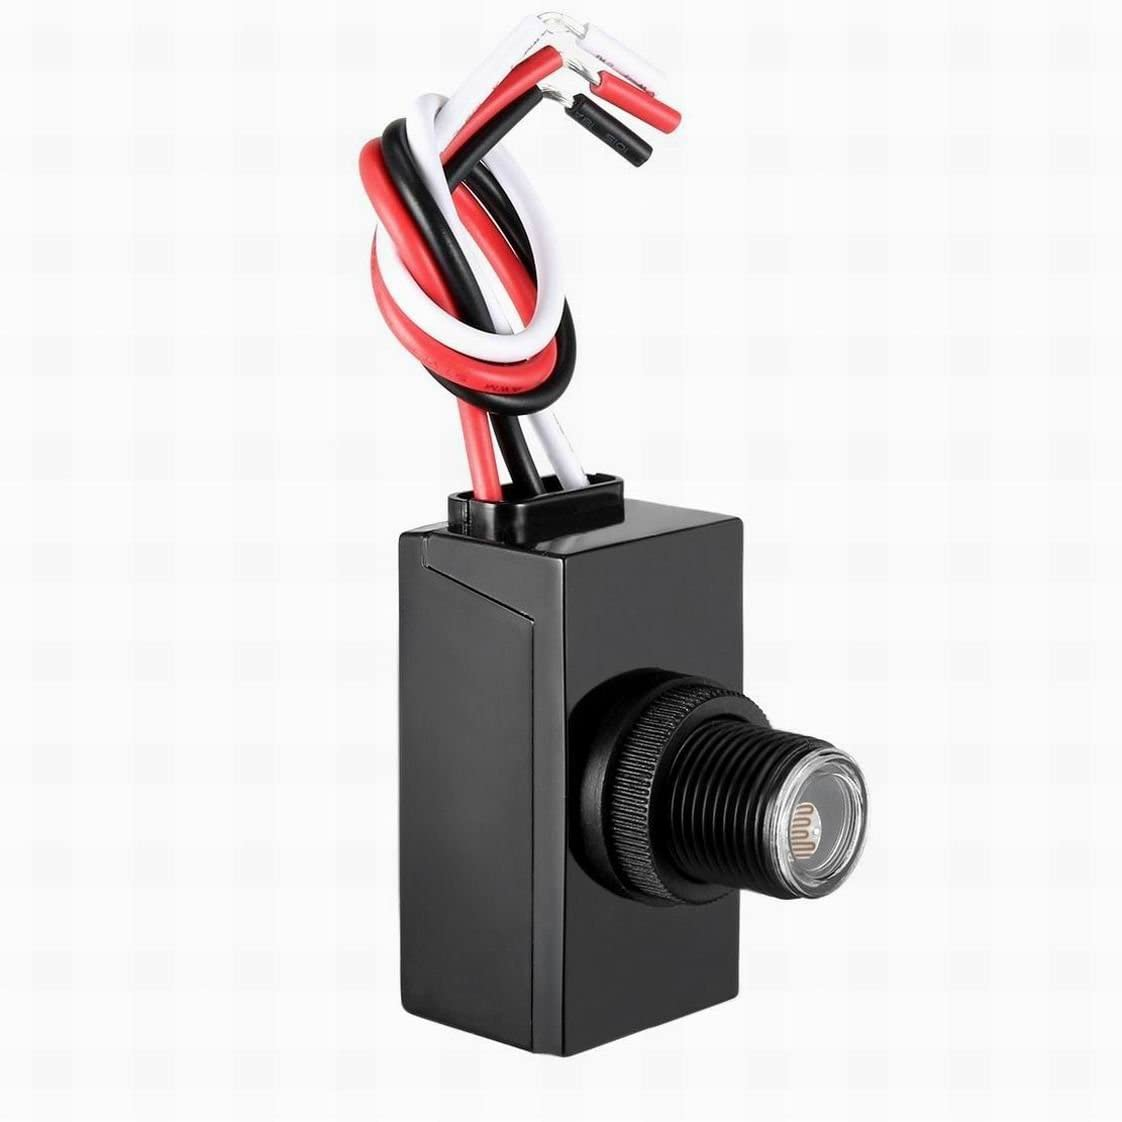 MariaP Dusk Dawn Photo Control Photocell 120-277 V Outdoor Photocell Light  Sensor Lighting Switch - - Amazon.comAmazon.com